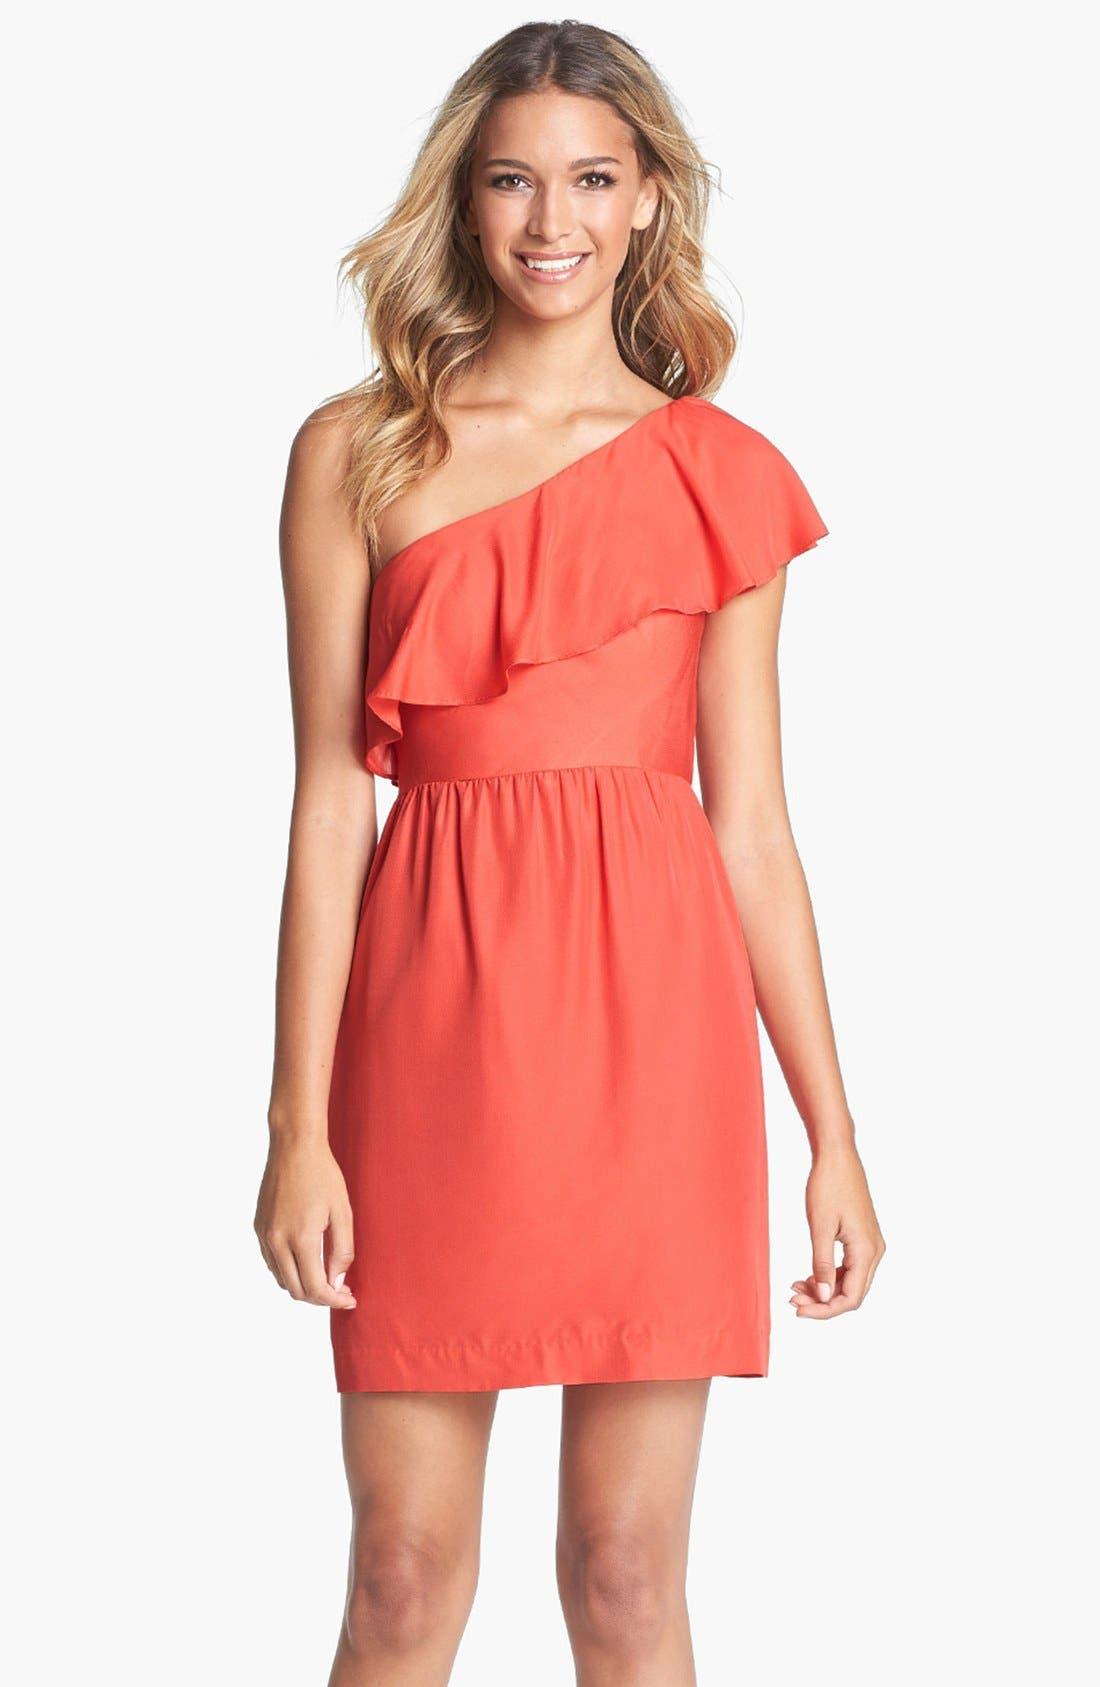 Alternate Image 1 Selected - Jenny Yoo 'Lulu' Ruffled One-Shoulder Sheath Dress (Online Only)